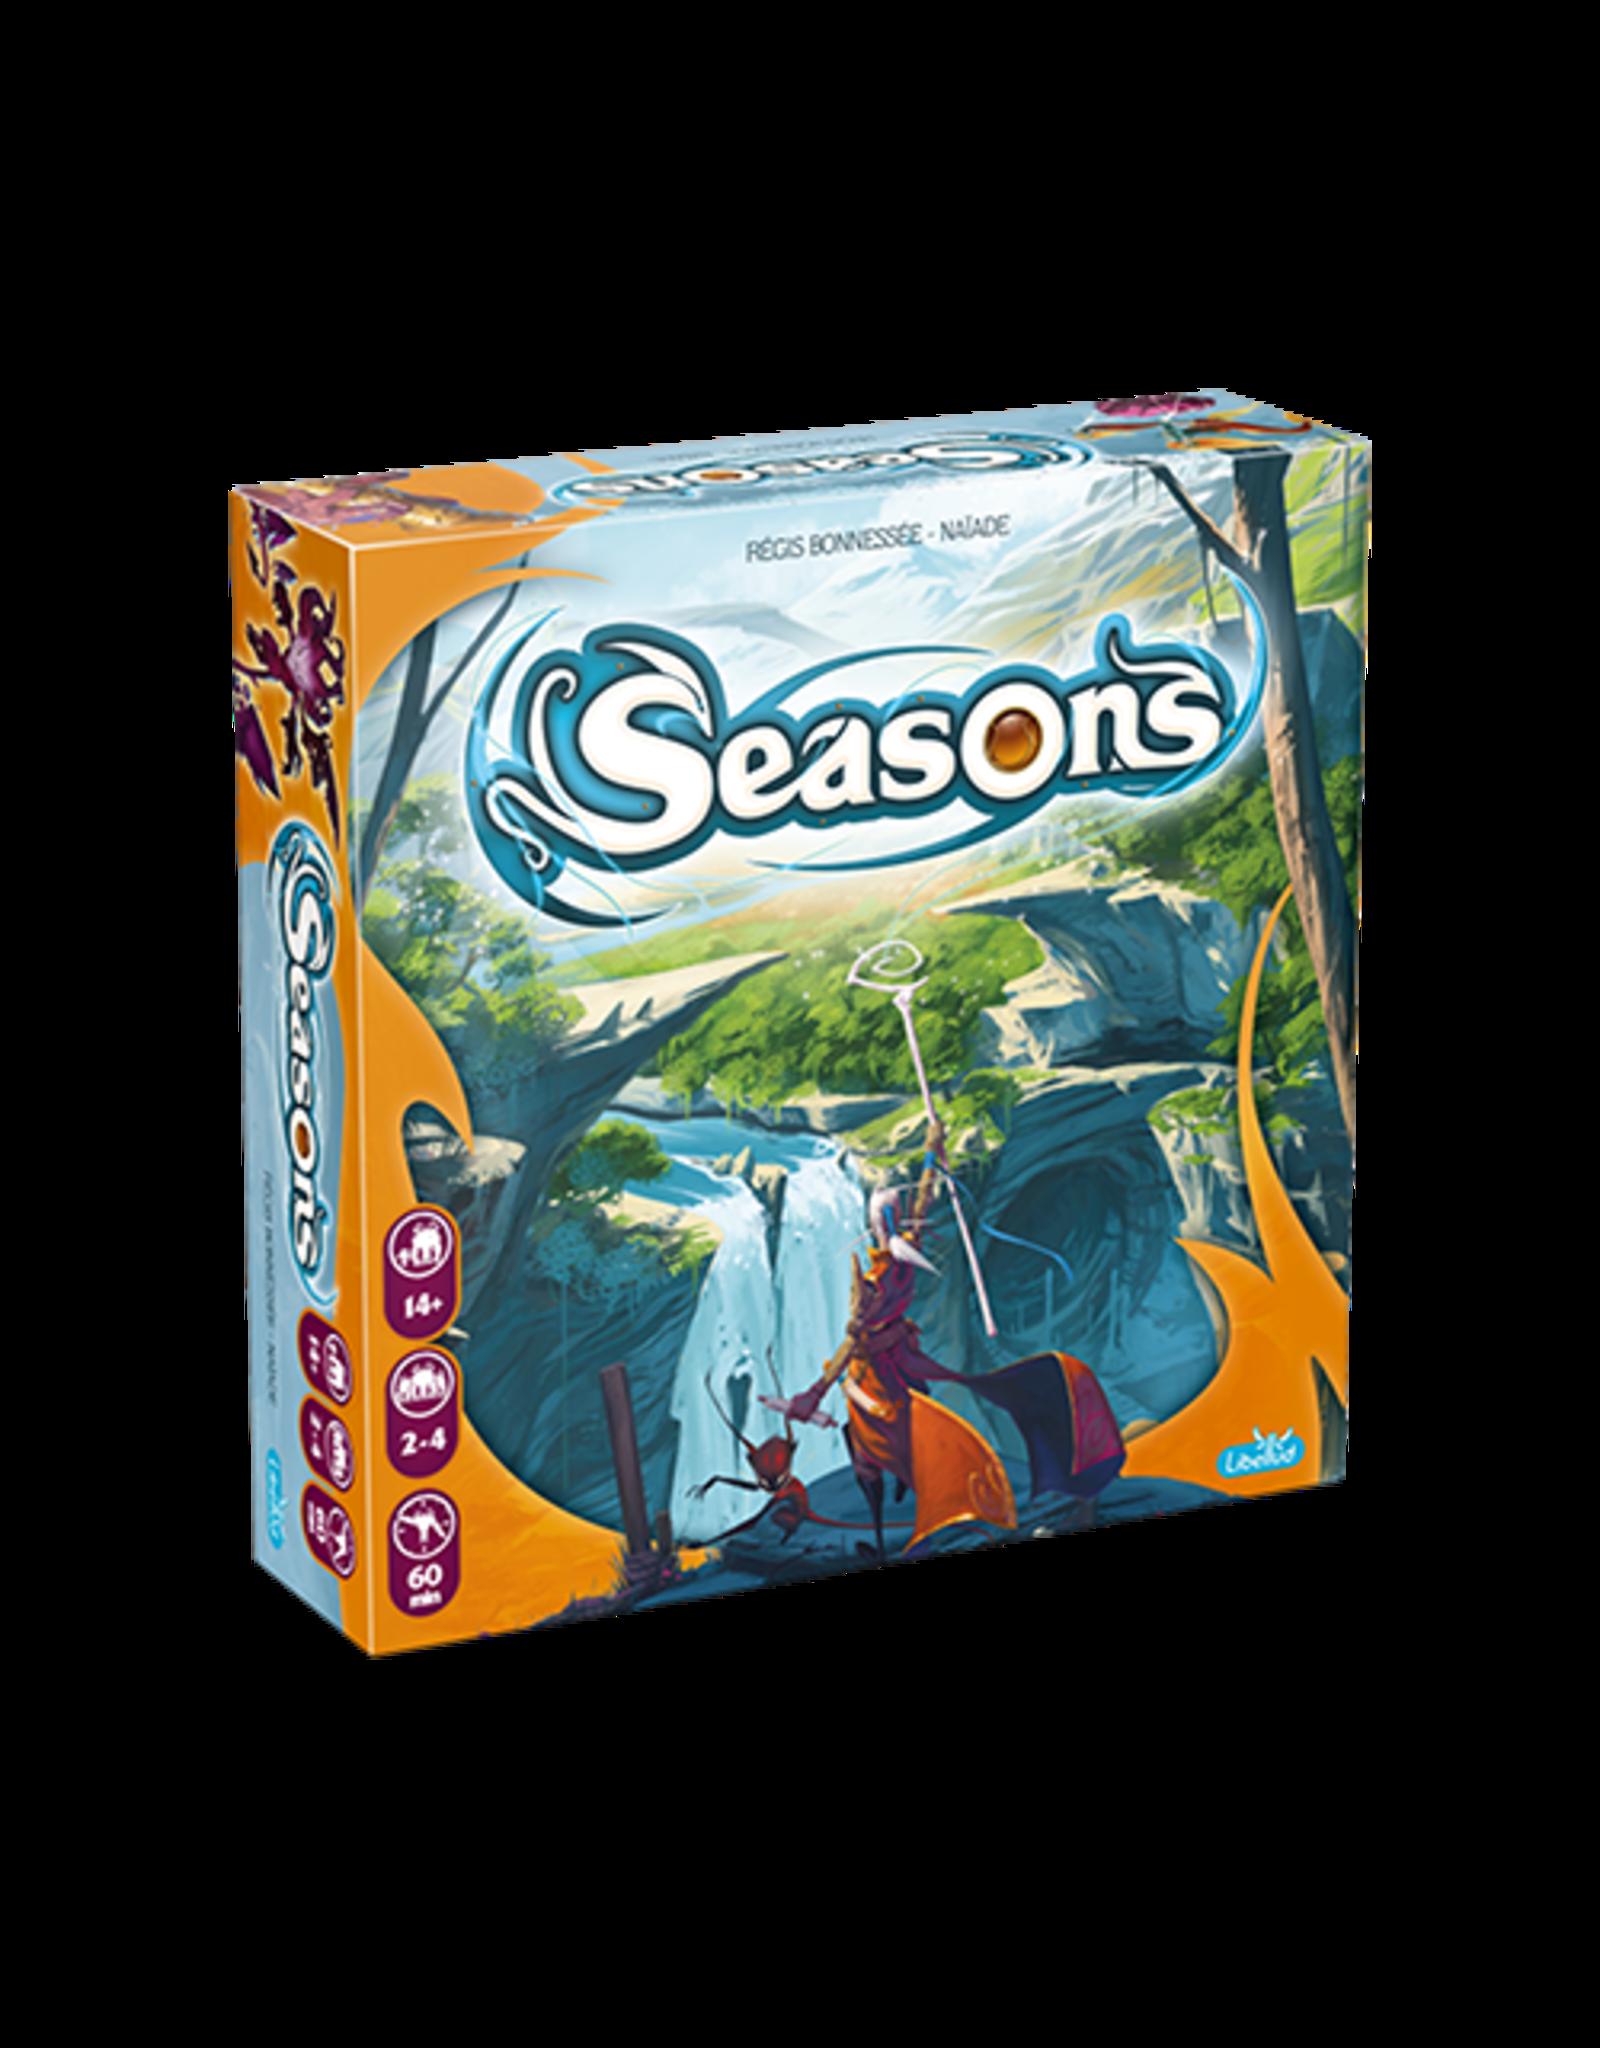 Libellud Seasons